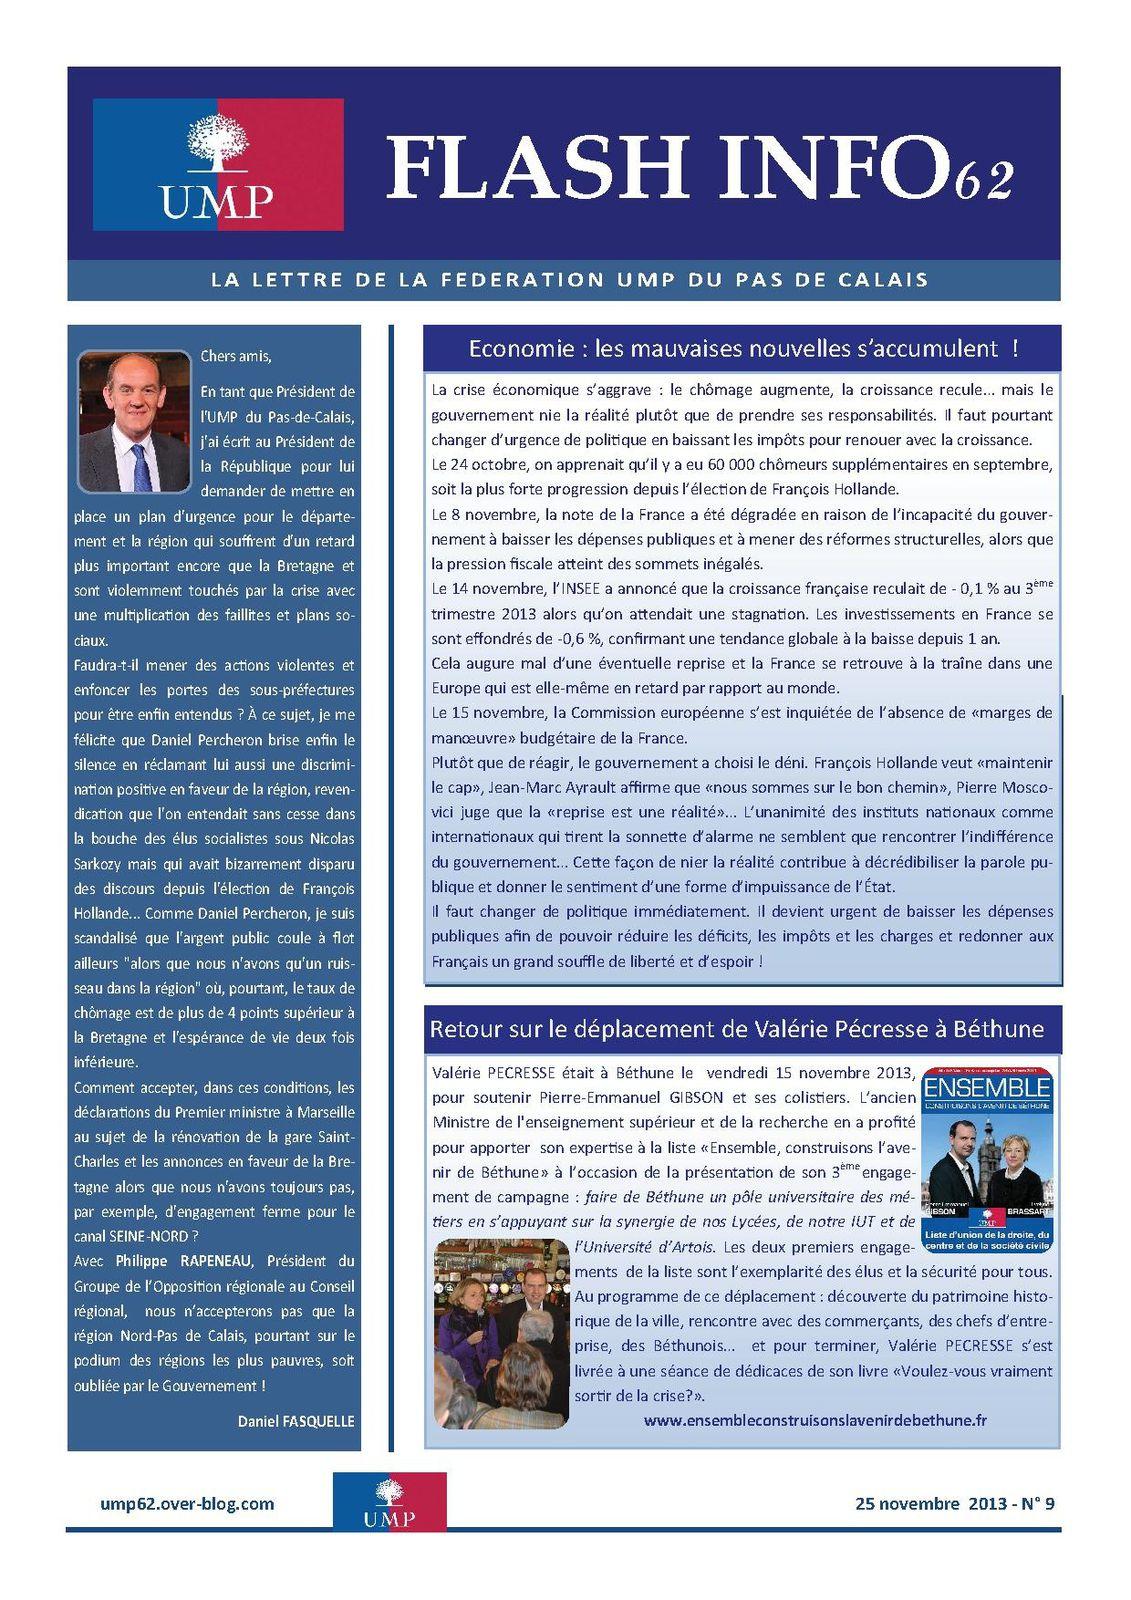 Flash-info n°9 du 25 novembre 2013